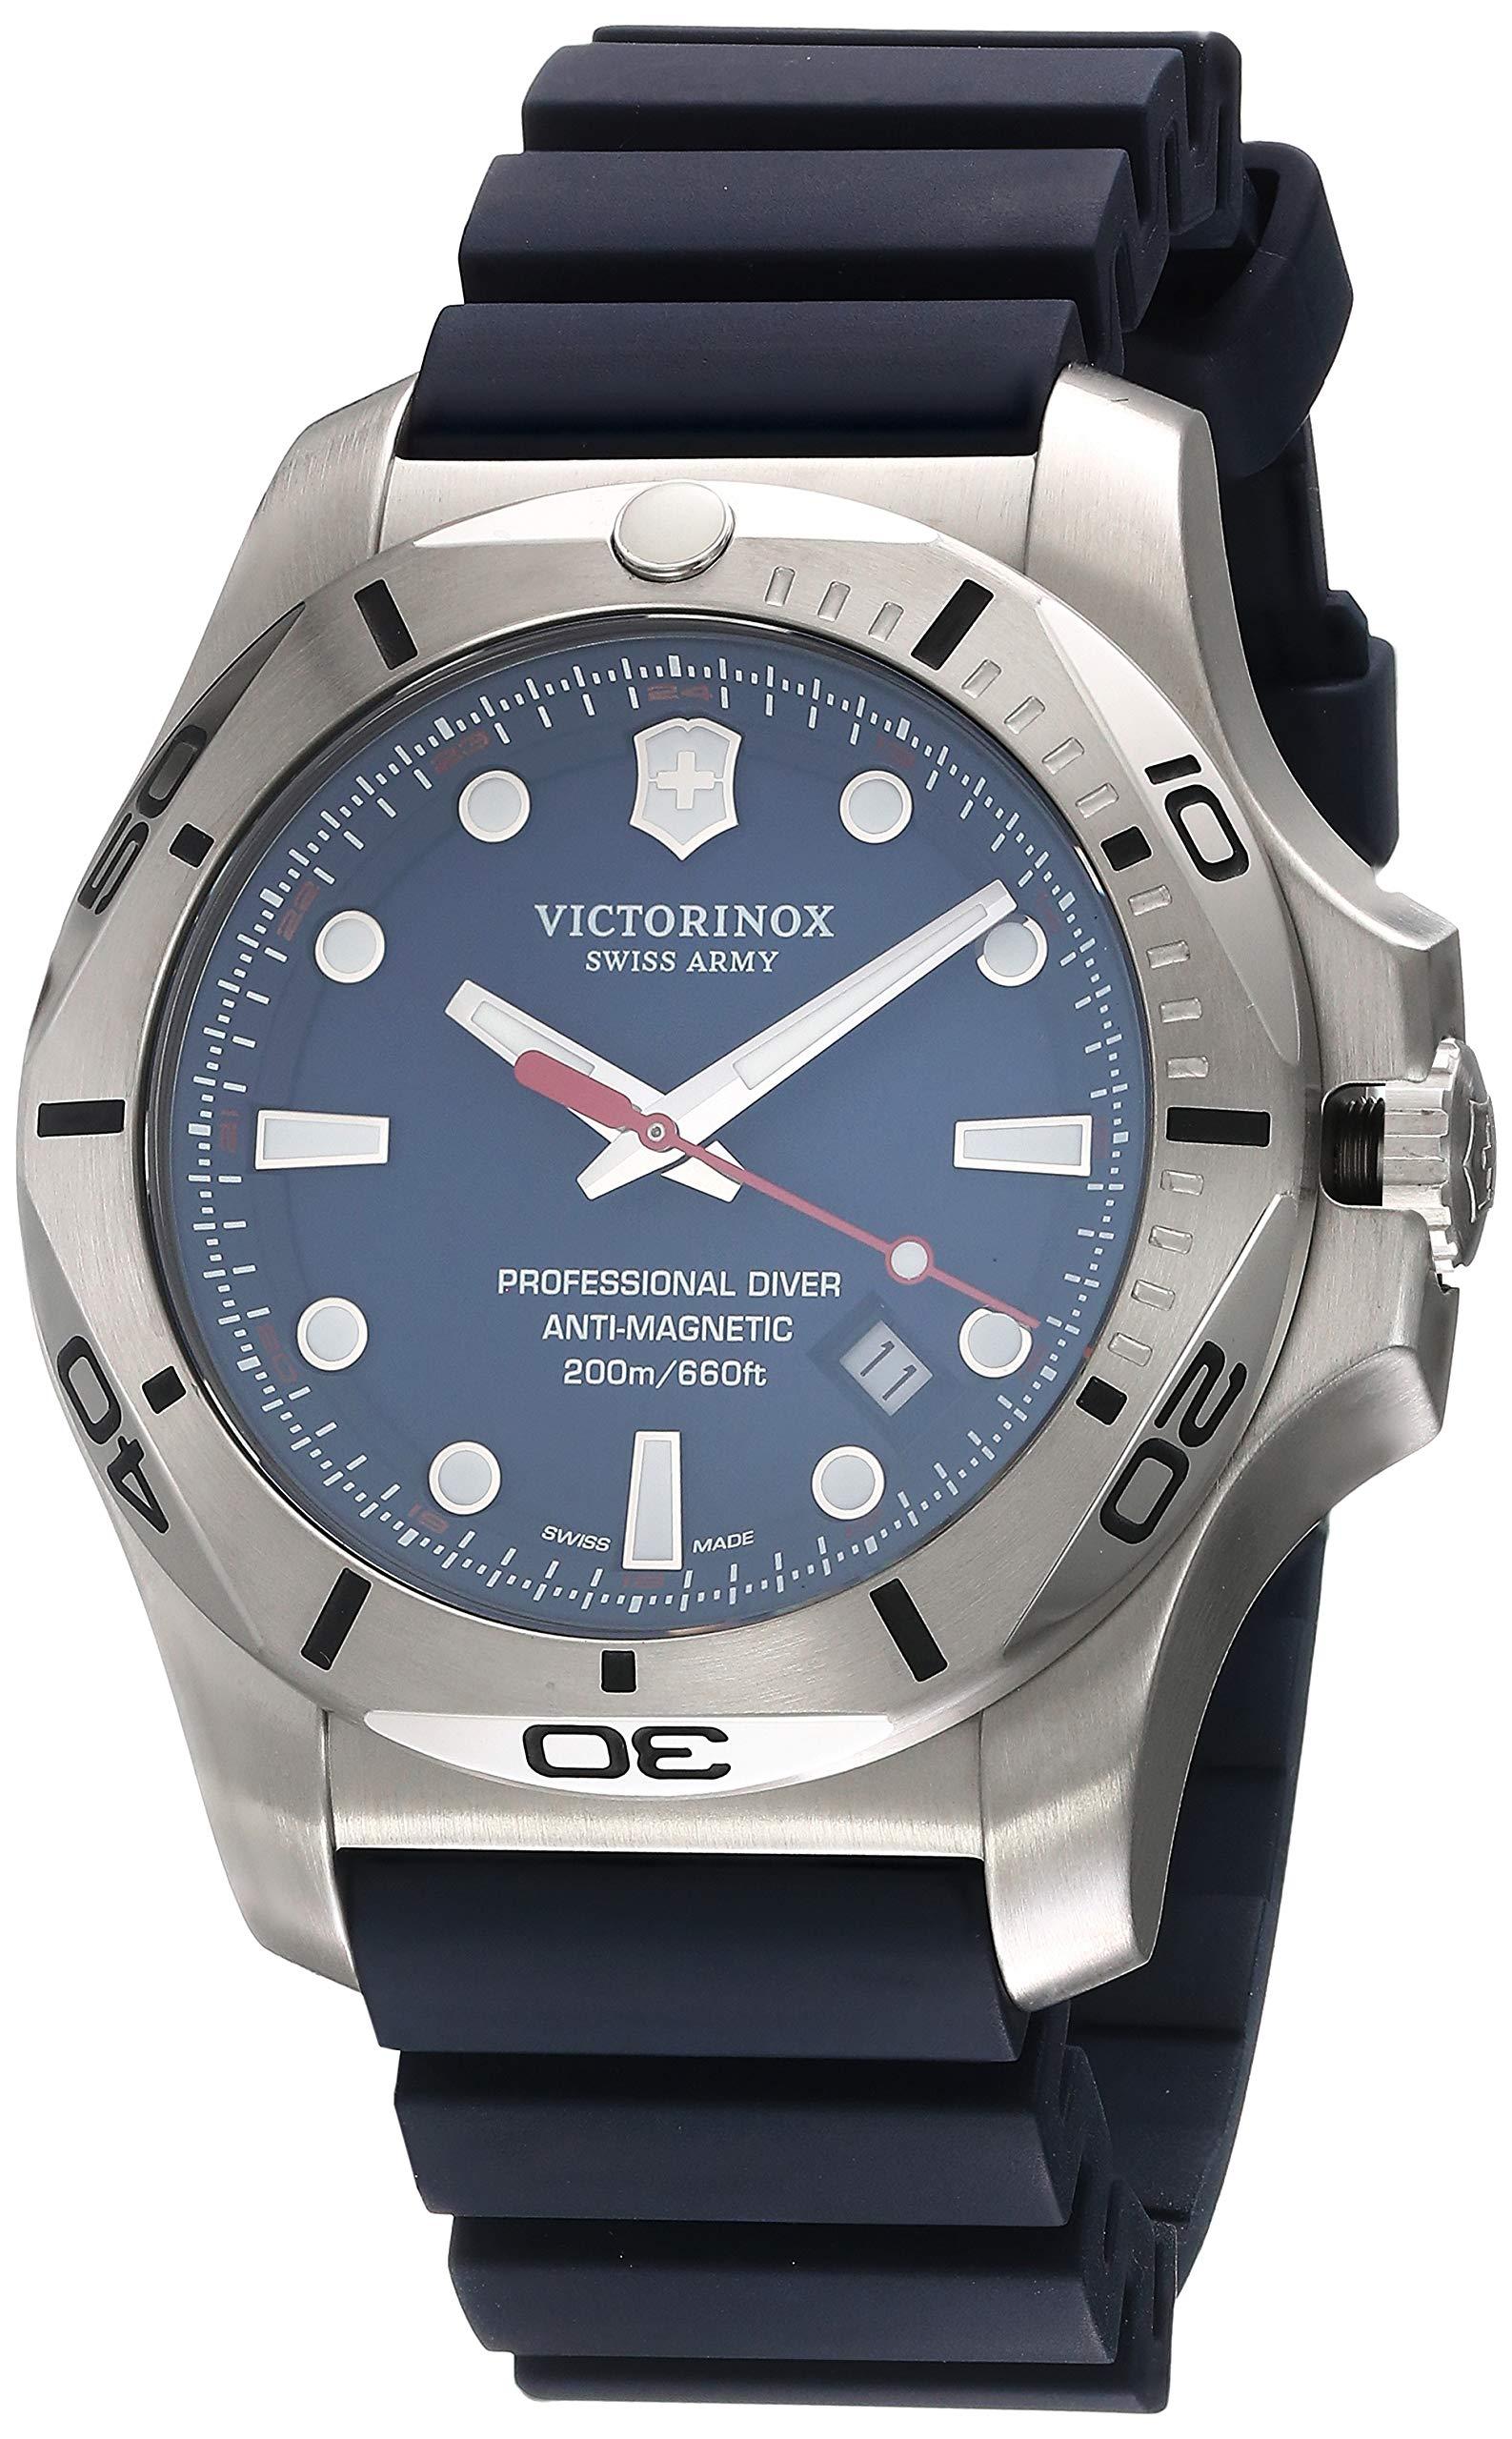 Victorinox Swiss Army Unisex Analogue Quartz Watch 241734